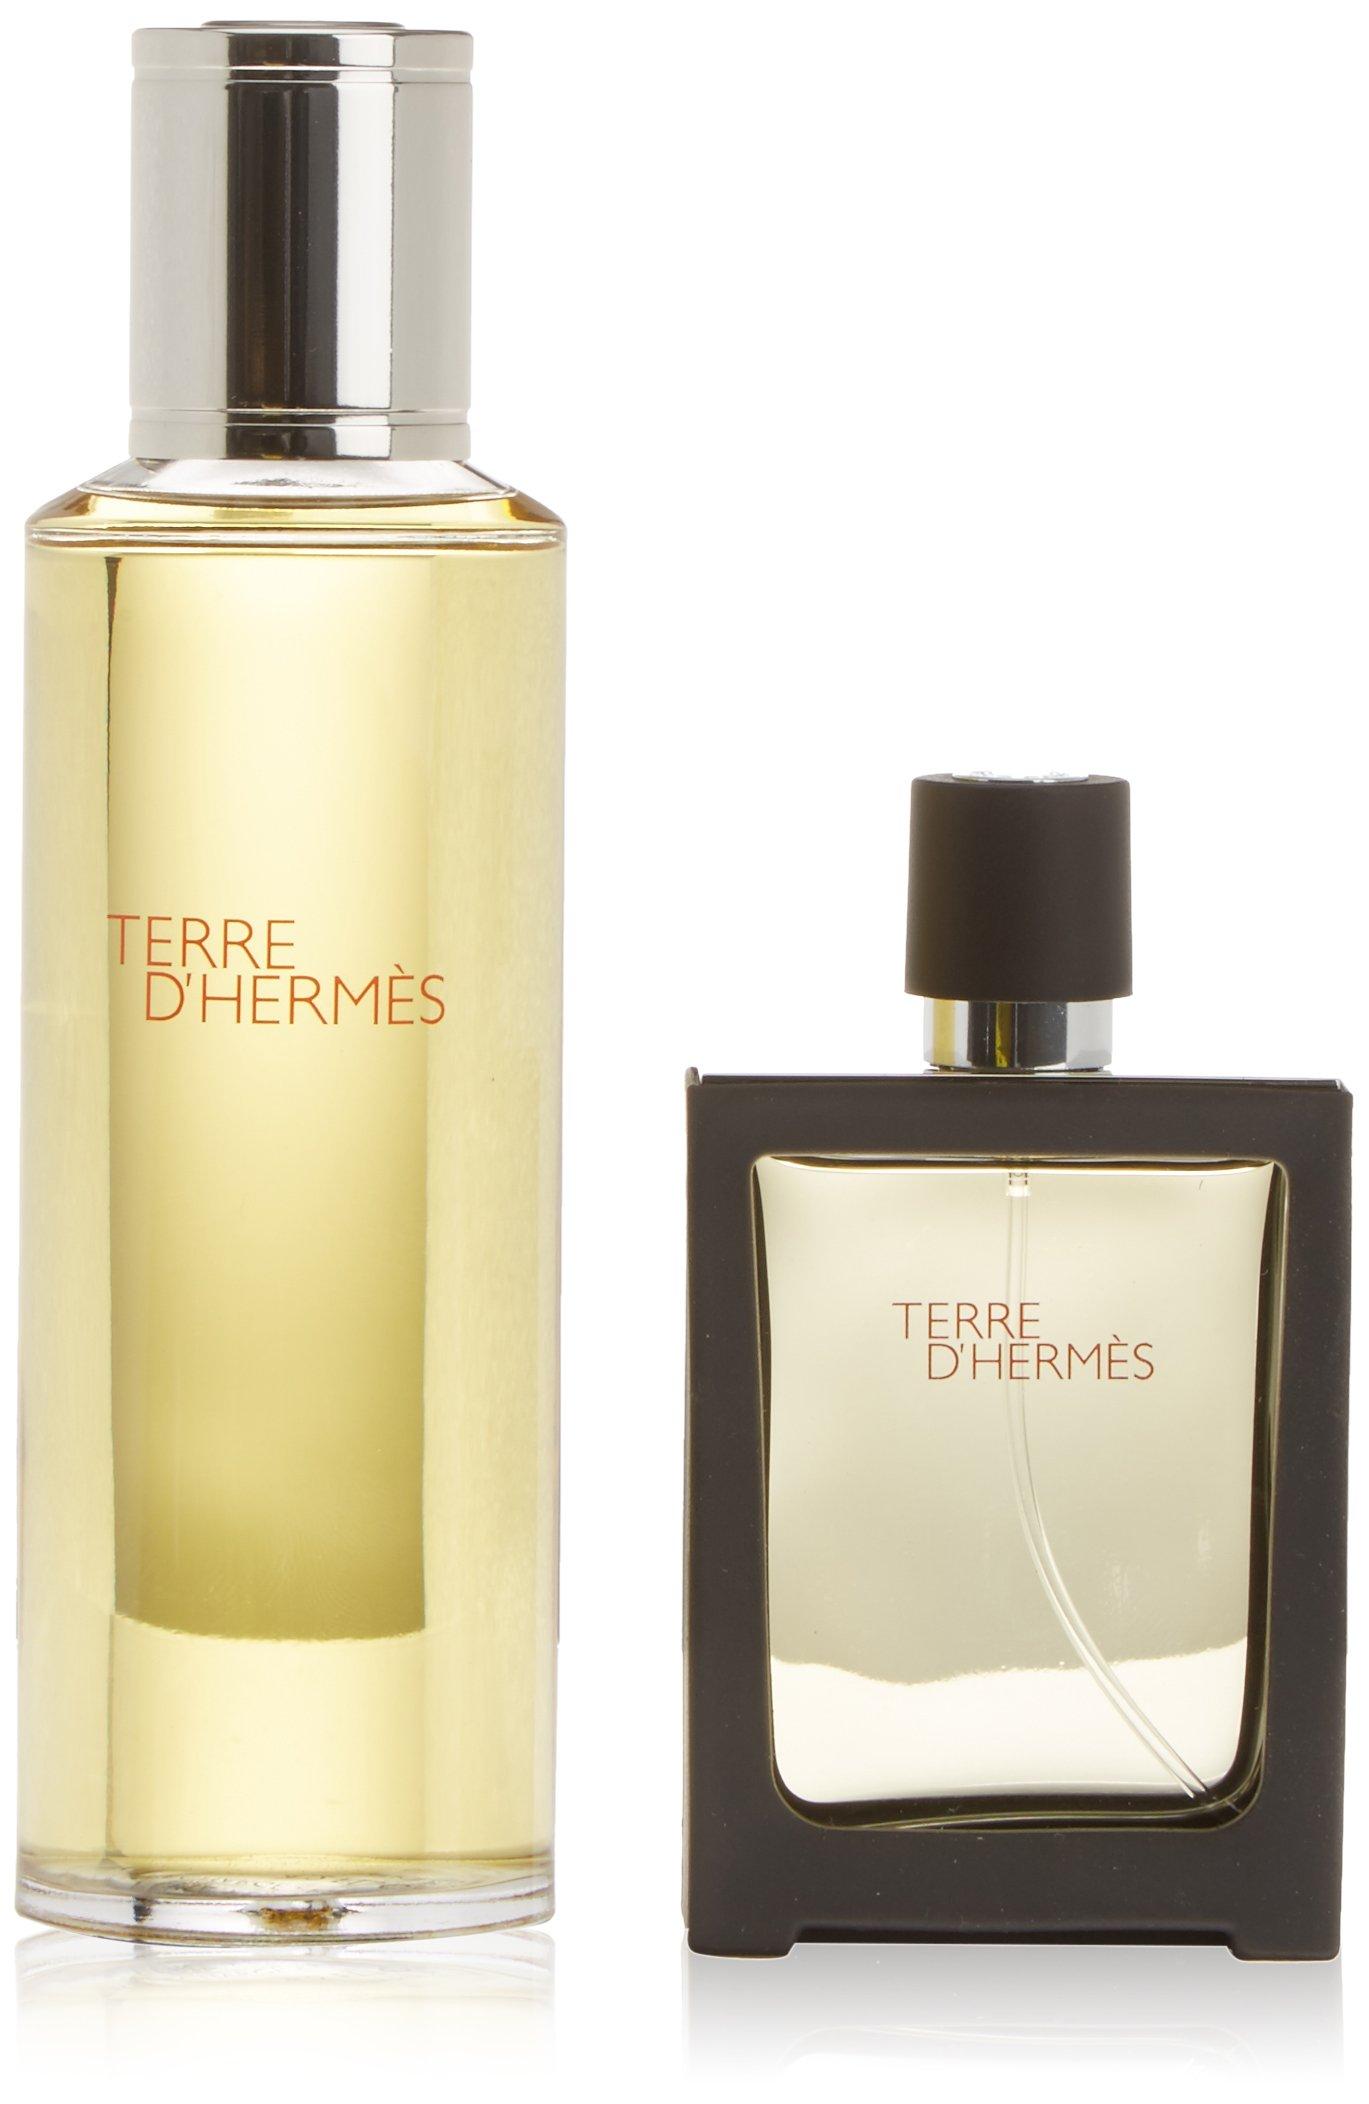 Hermes Terre D'hermes Pure Perfume 2 Pc Set For Men (4.2 Parfum Refill + 1.0 Parfum Refillable Spr) by HERMES